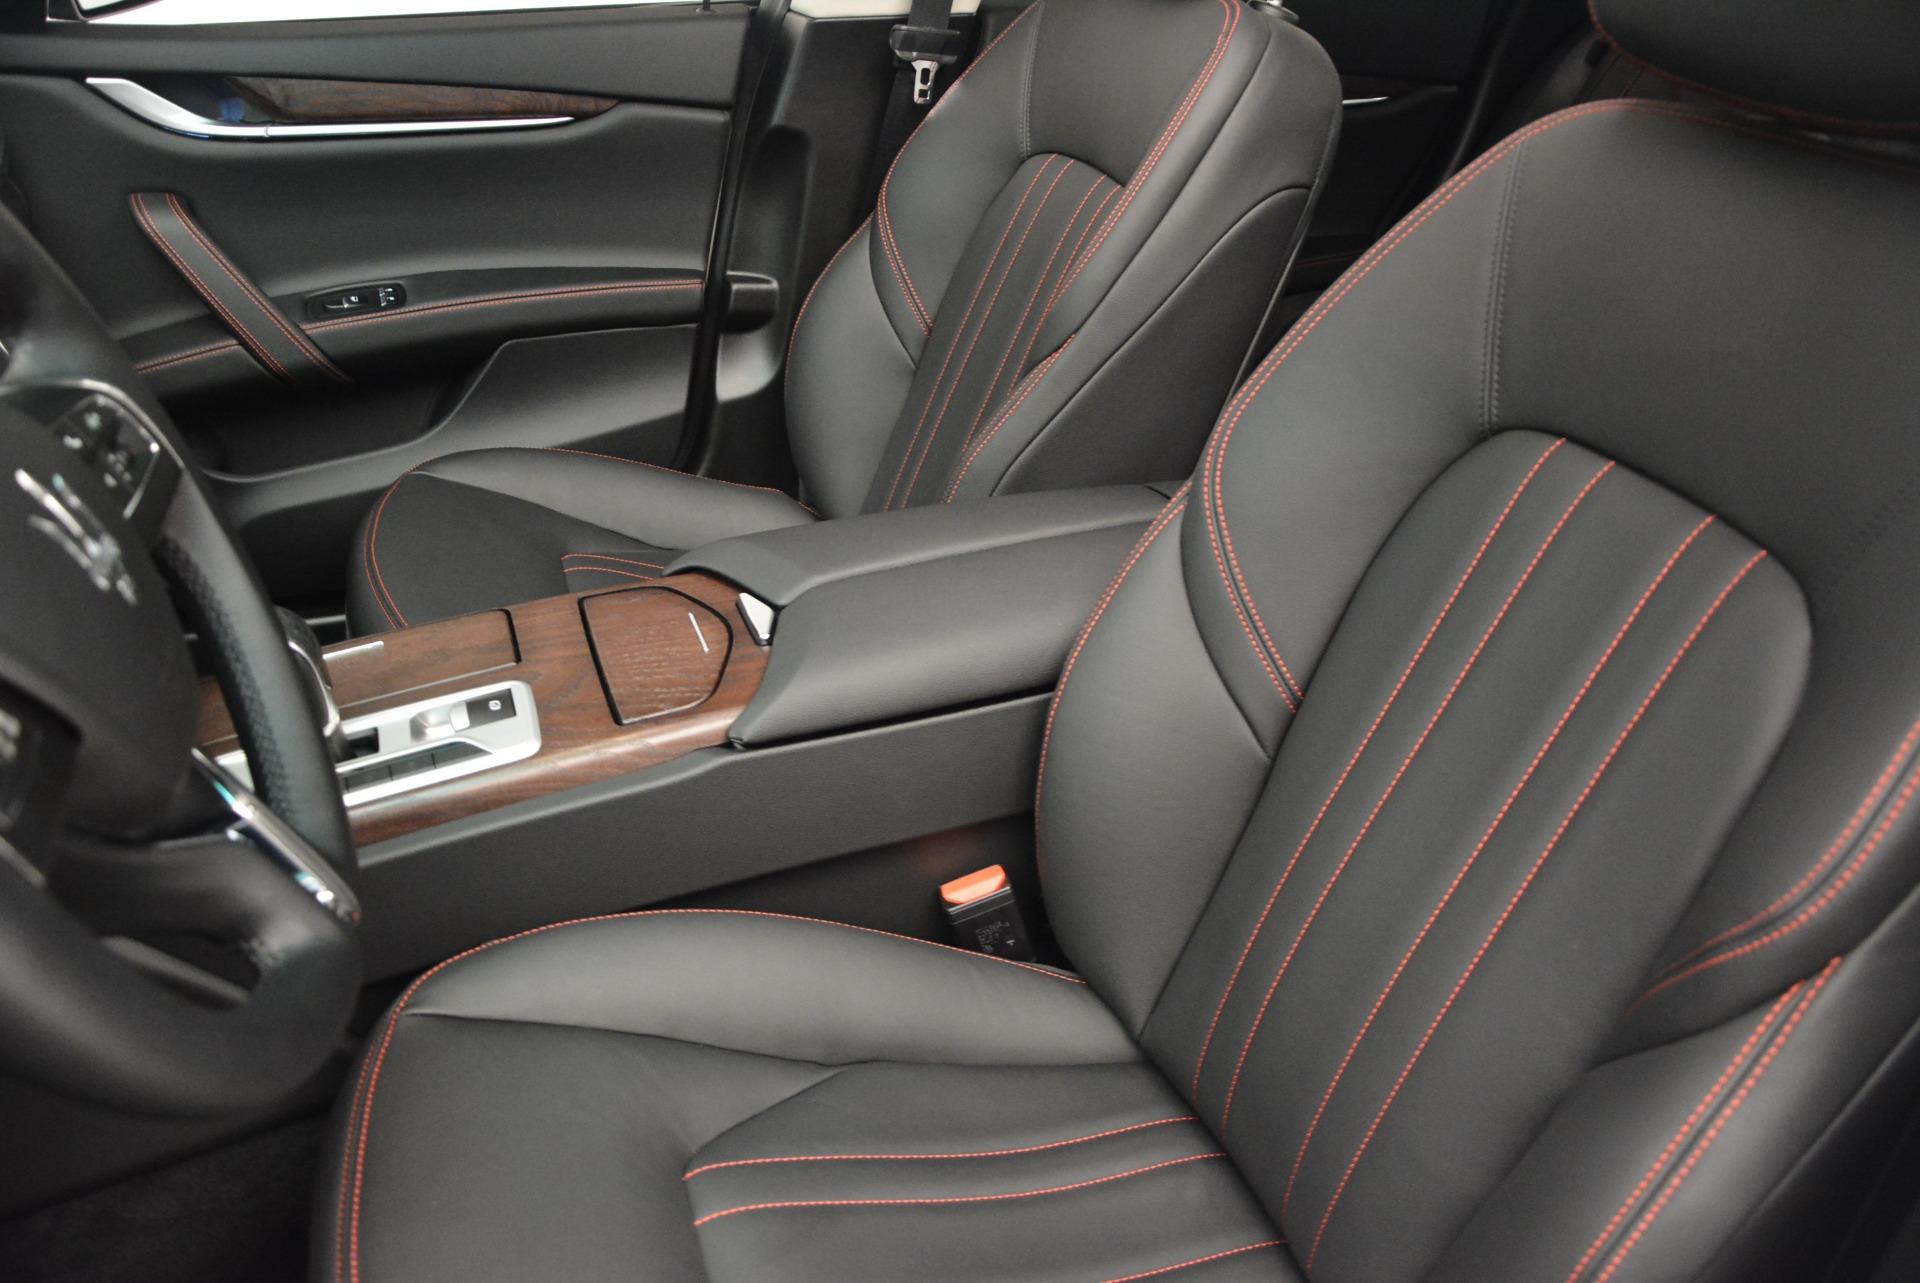 Used 2015 Maserati Ghibli S Q4 For Sale In Greenwich, CT. Alfa Romeo of Greenwich, 7325 2070_p14